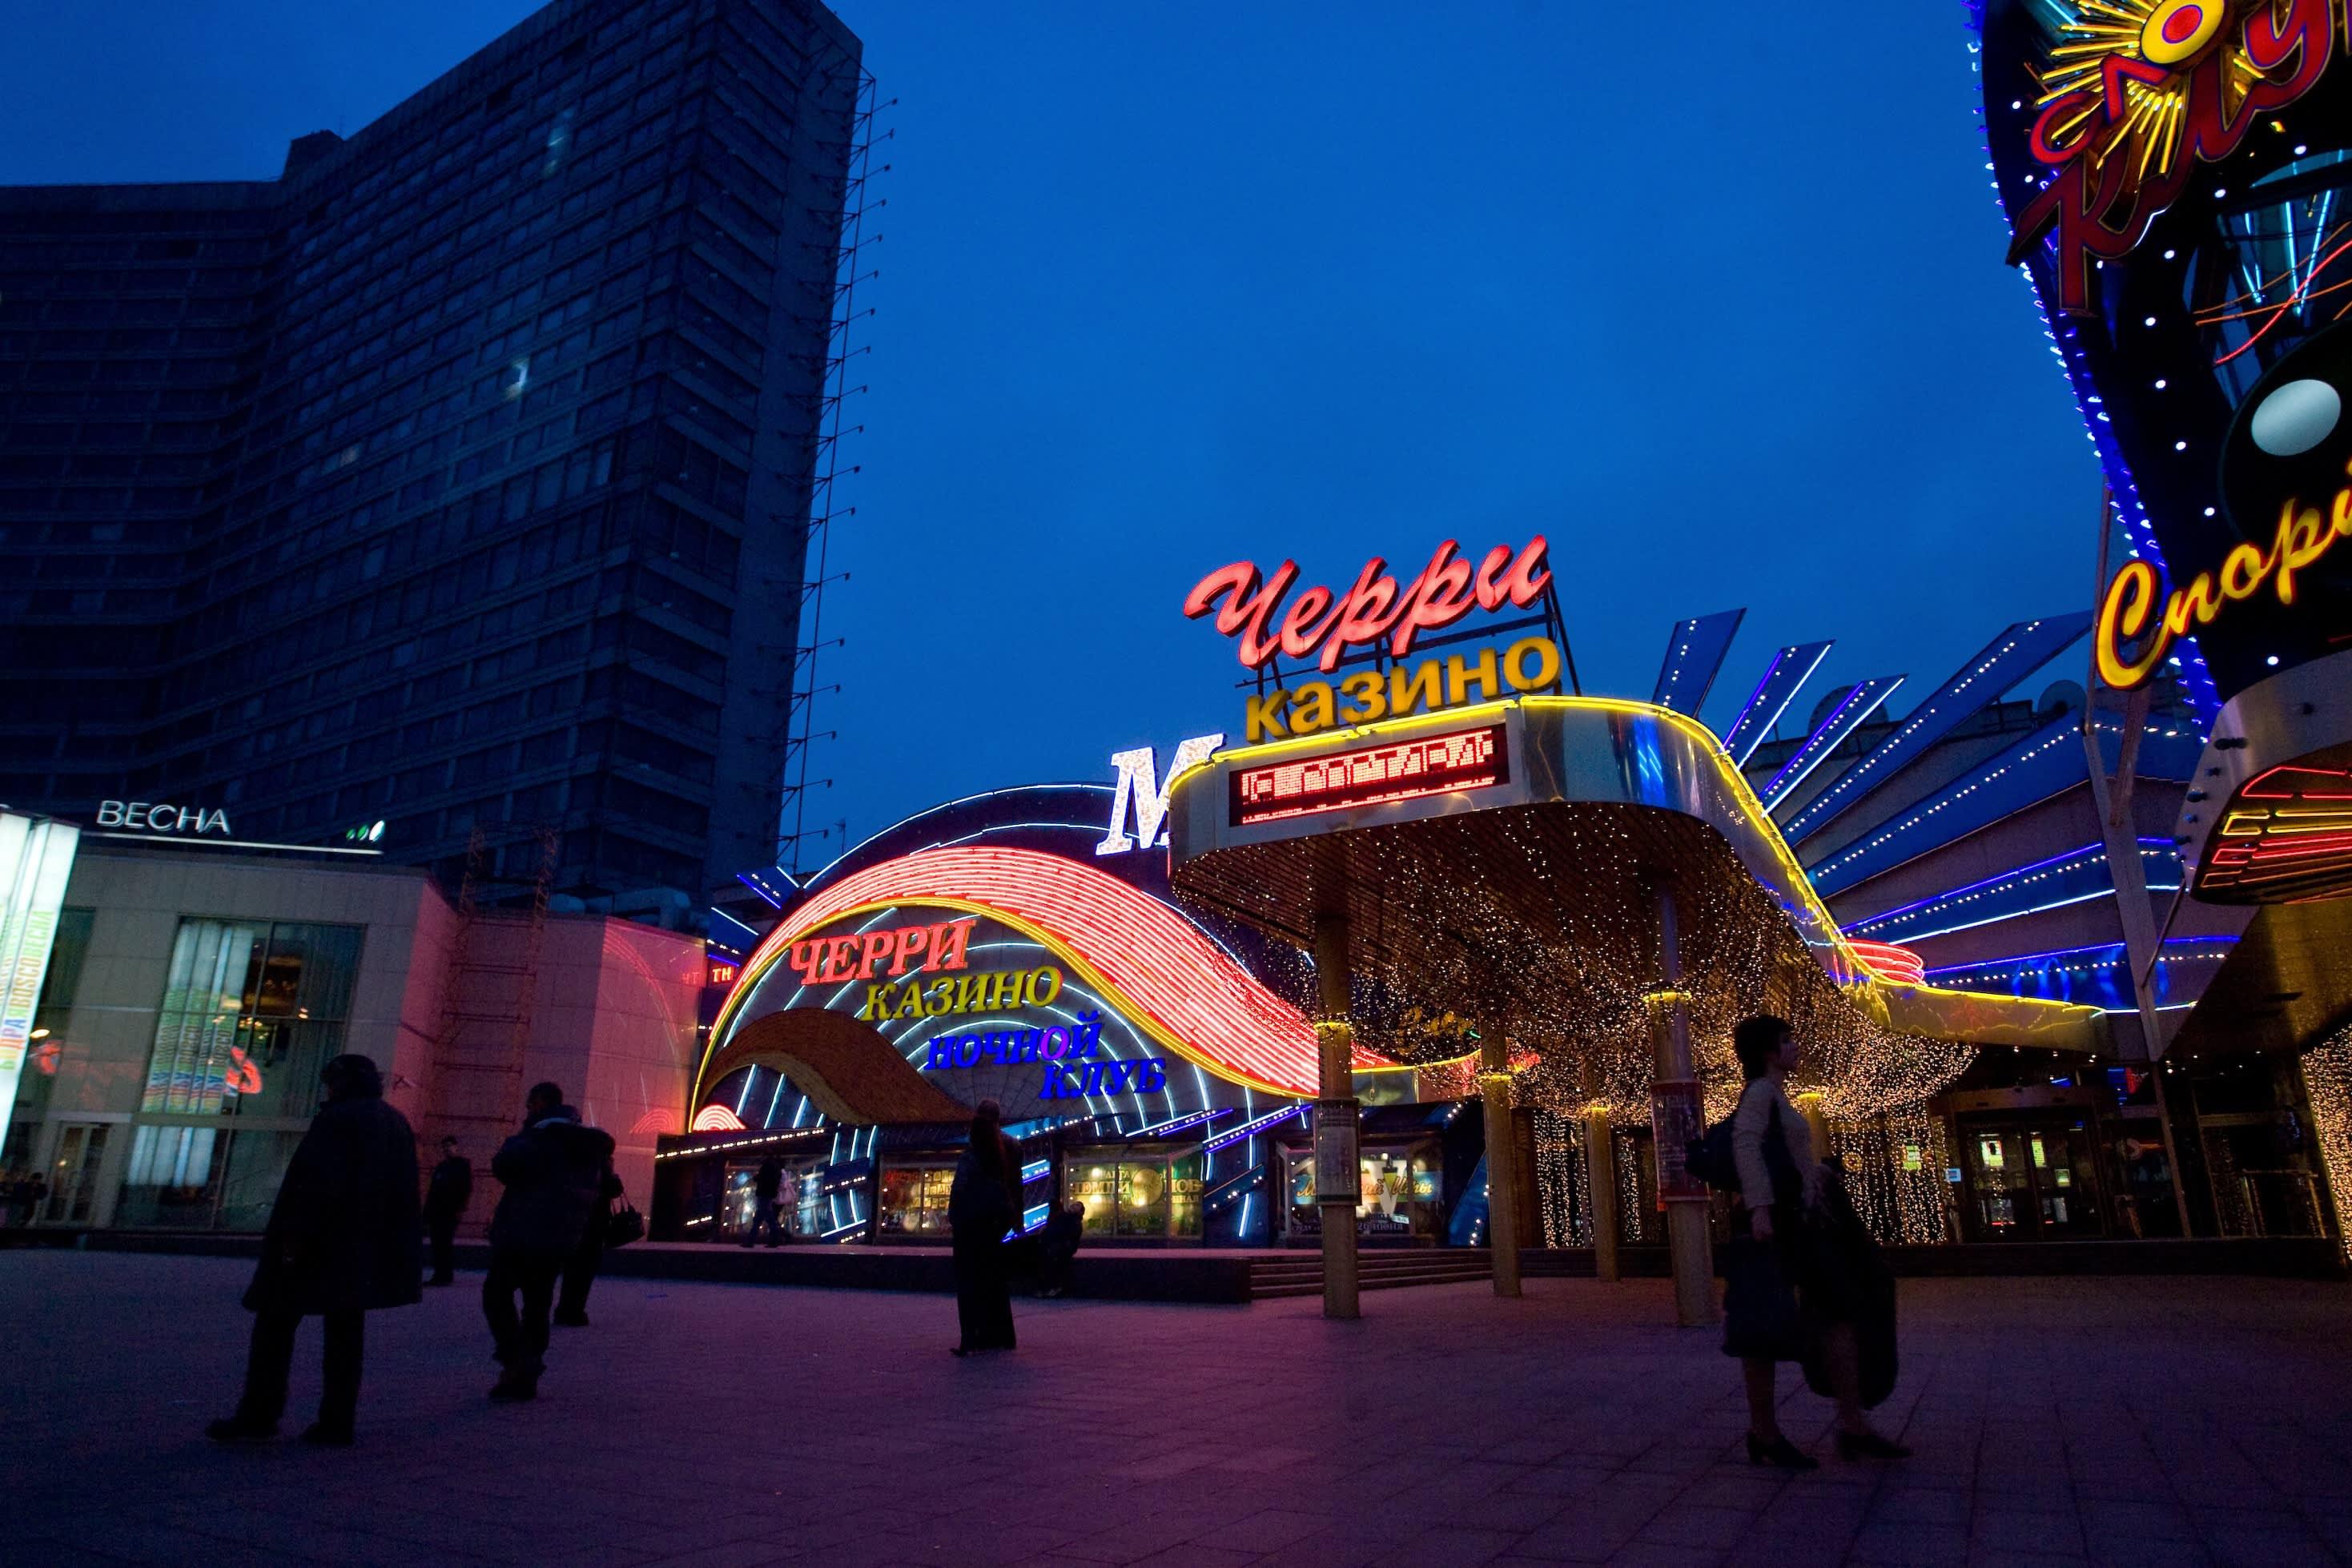 Casinos in moscow emerge lakeland casino